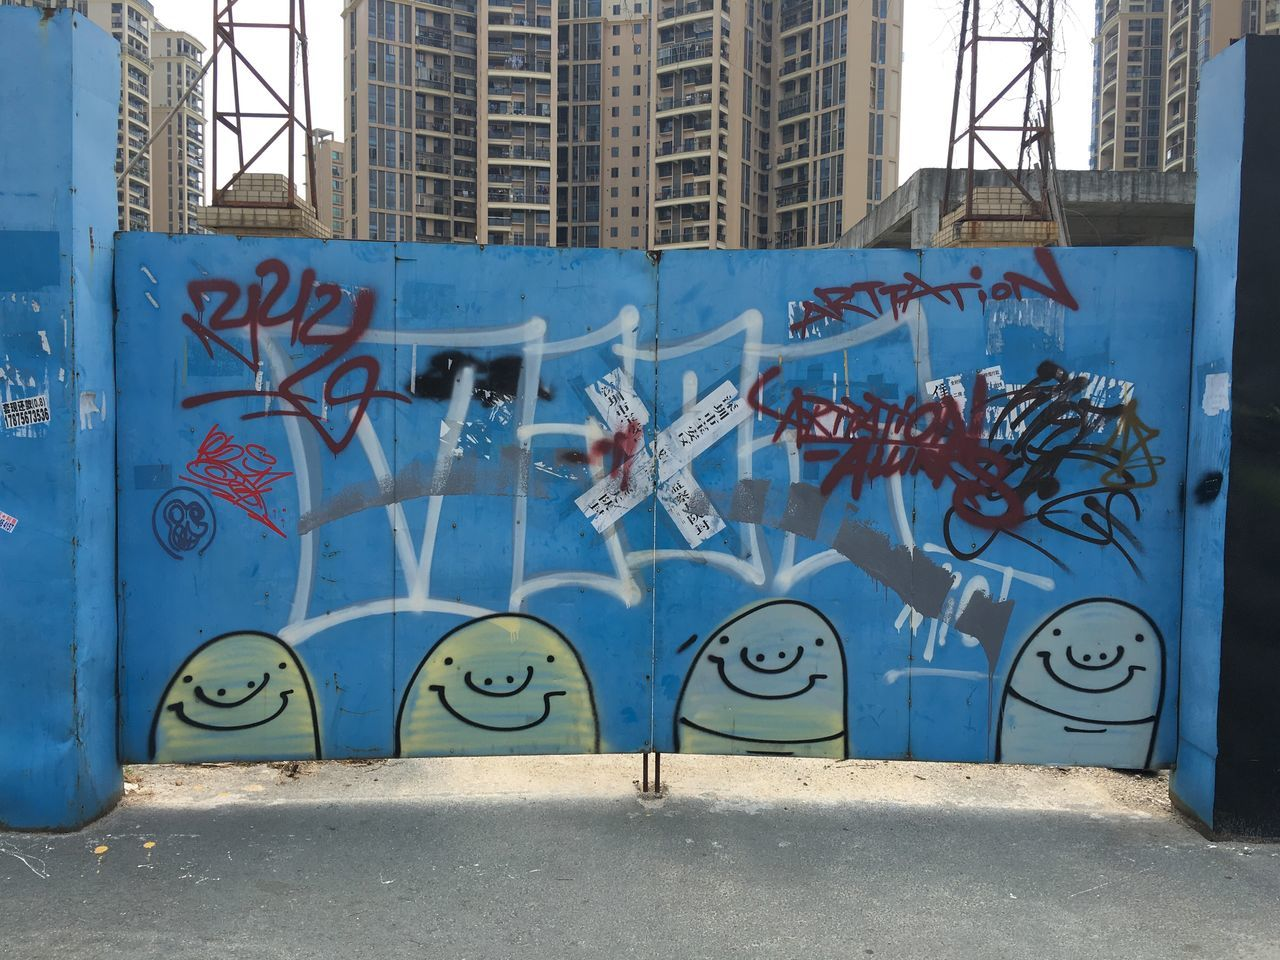 Beautiful stock photos of grafiken, graffiti, building exterior, architecture, built structure